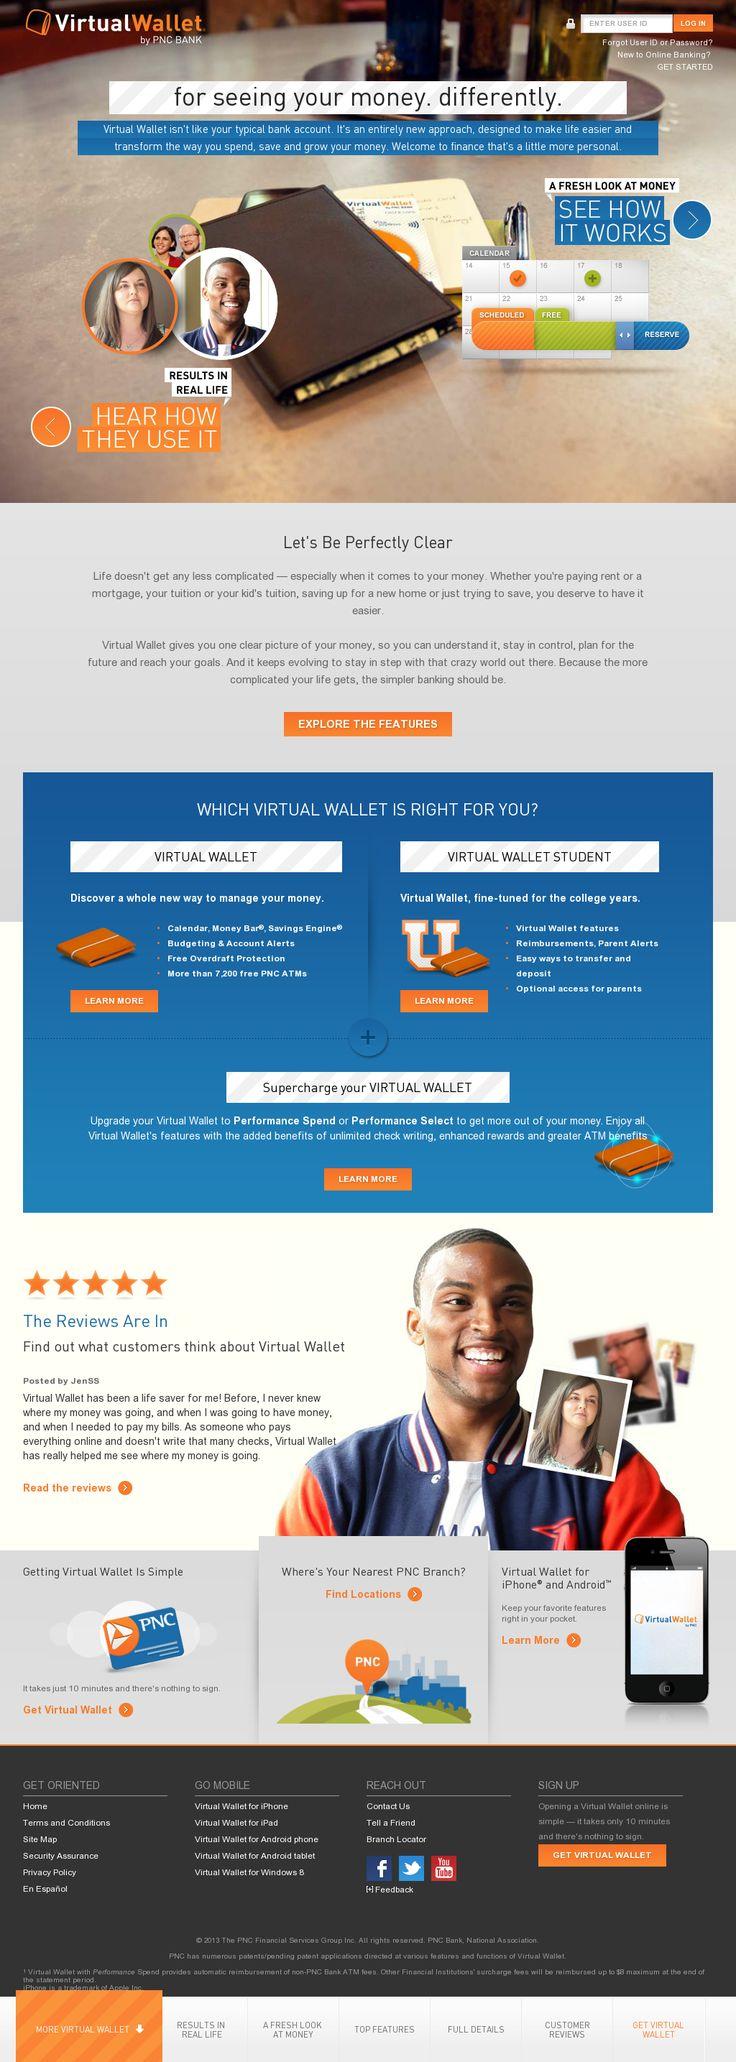 PNC Virtual Wallet (With images) Pnc virtual wallet, Web